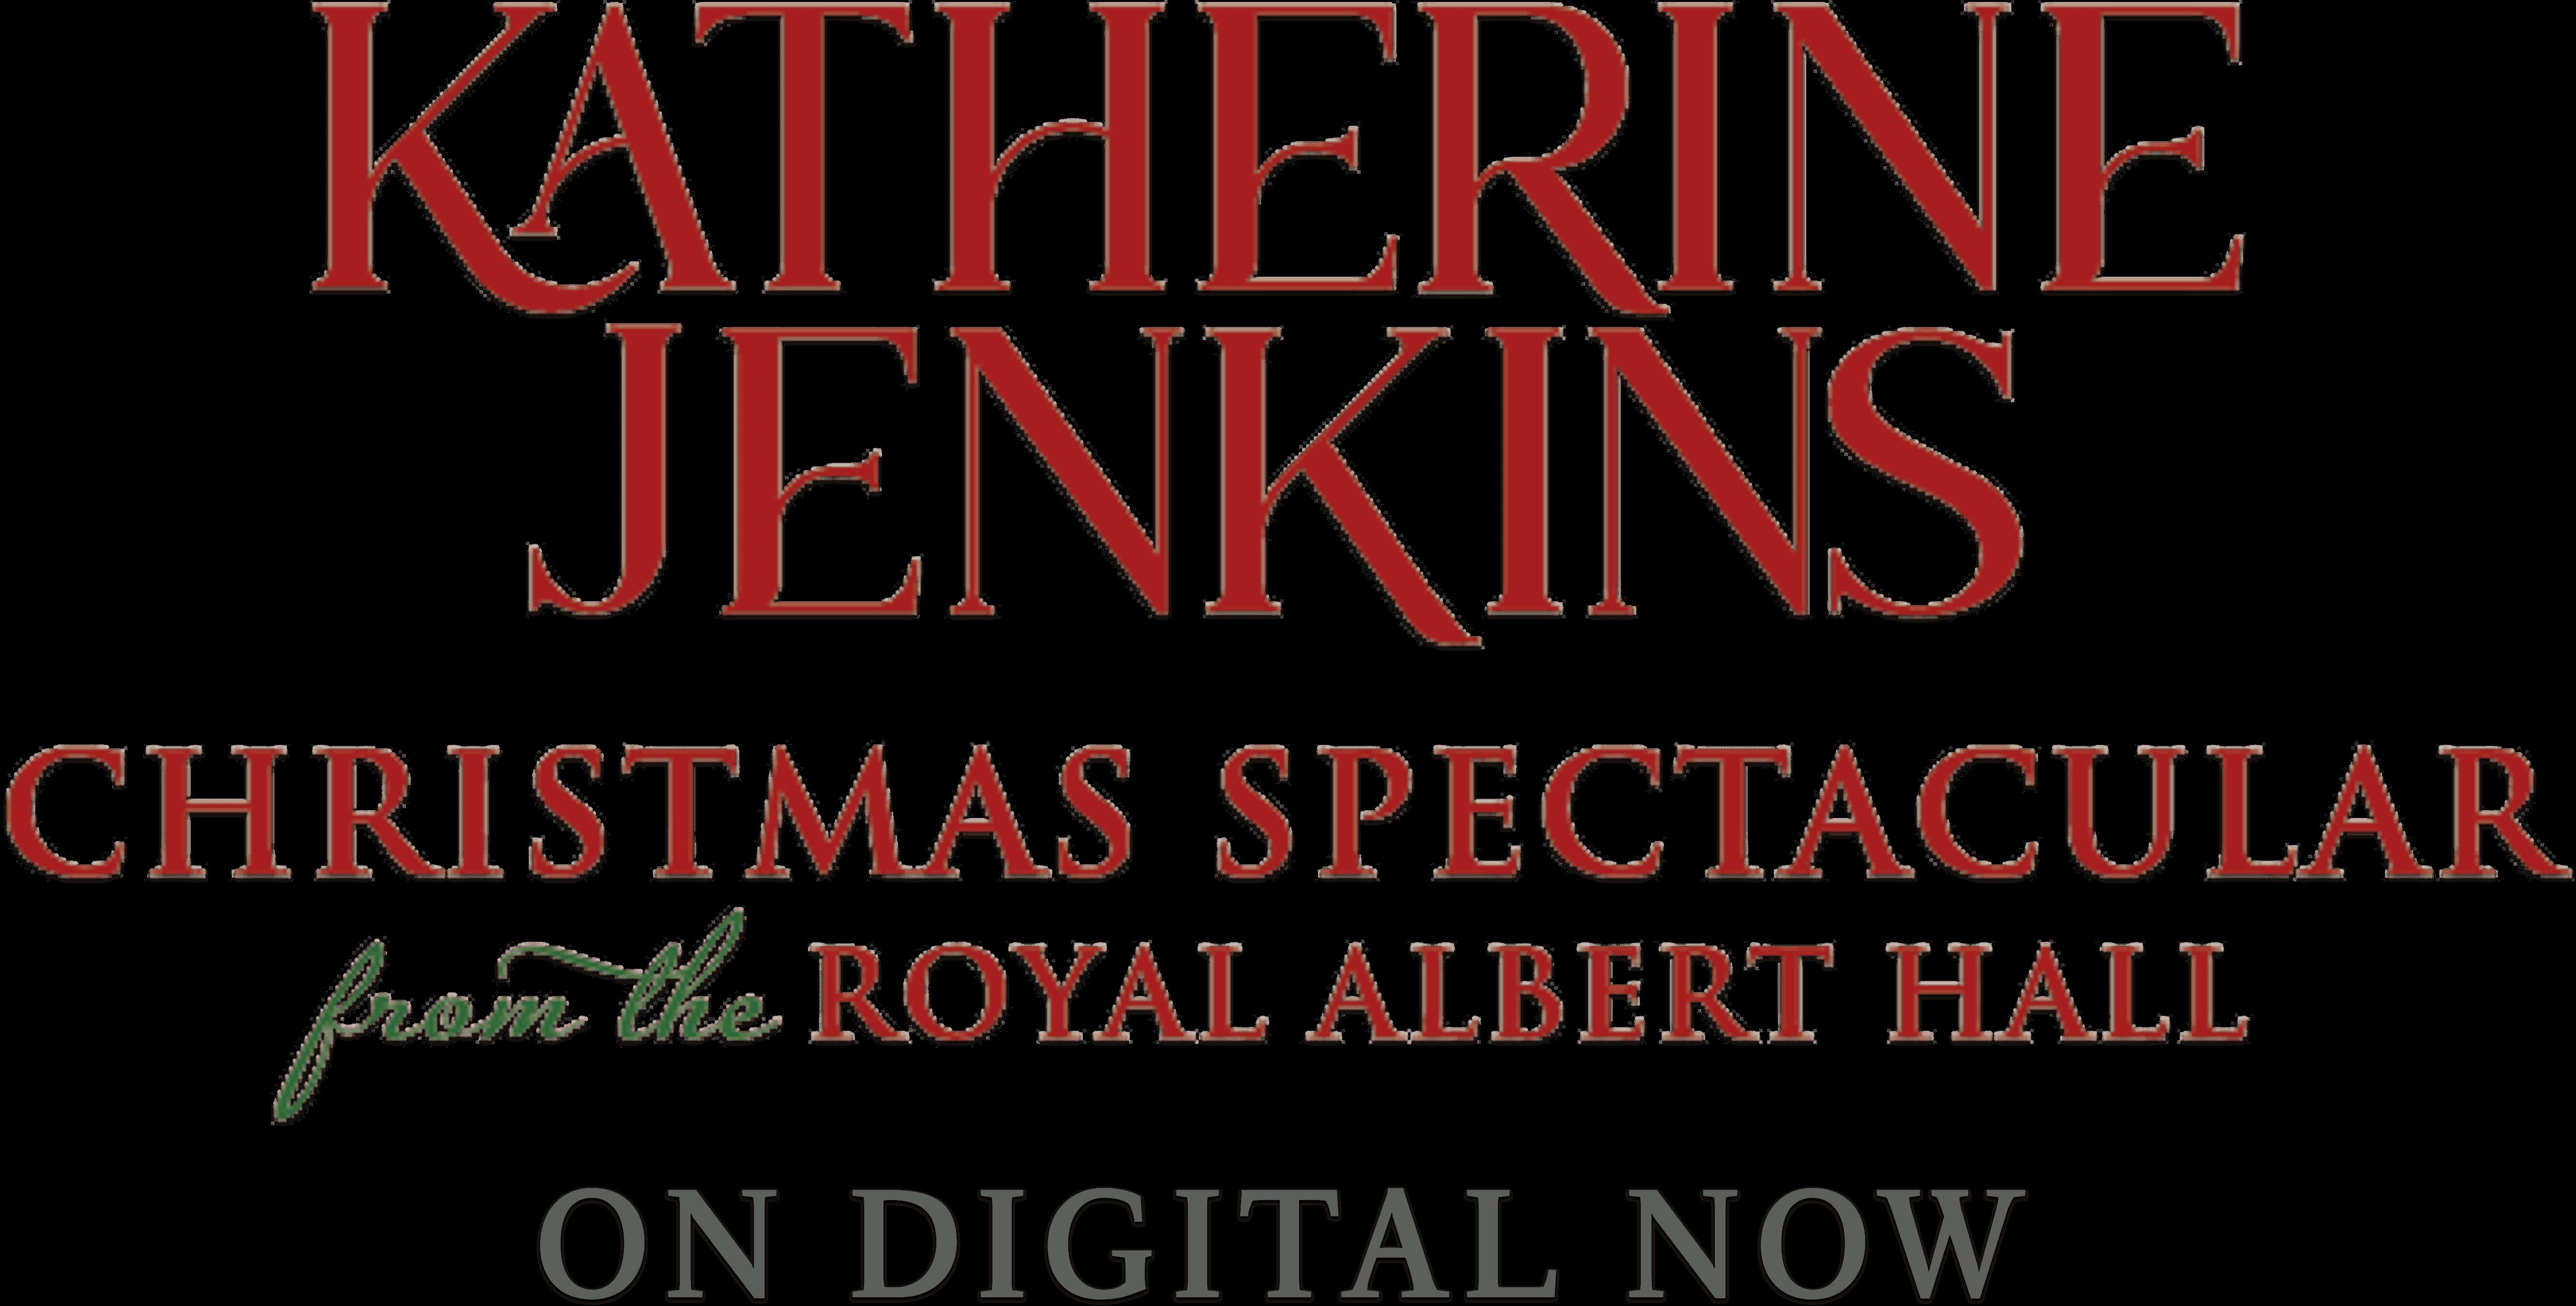 Katherine Jenkins Christmas Spectacular: Synopsis | Altitude Film